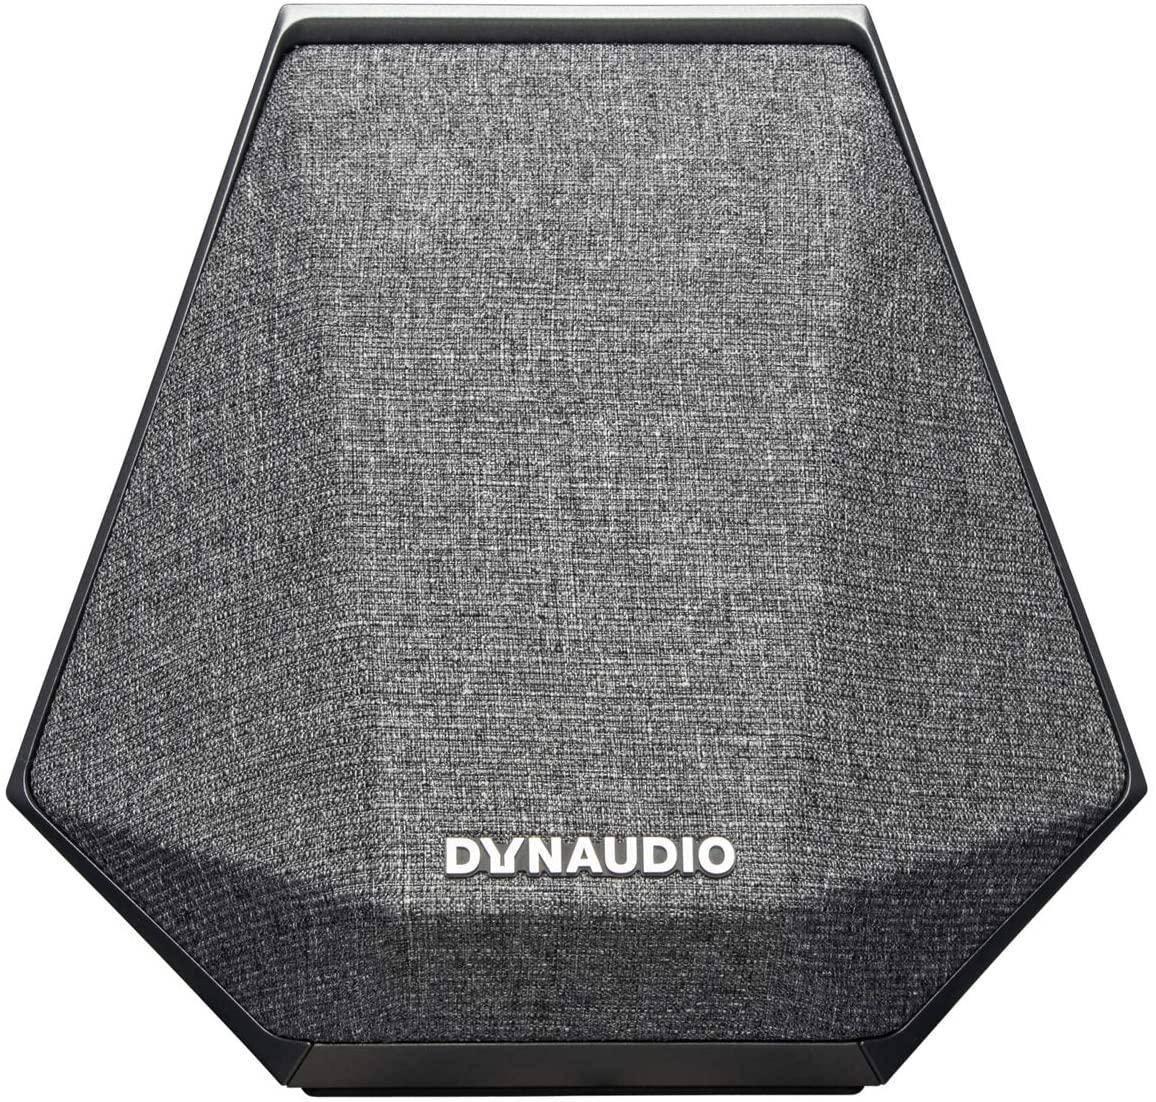 Dynaudio Music 1 Wireless Music System zoom image